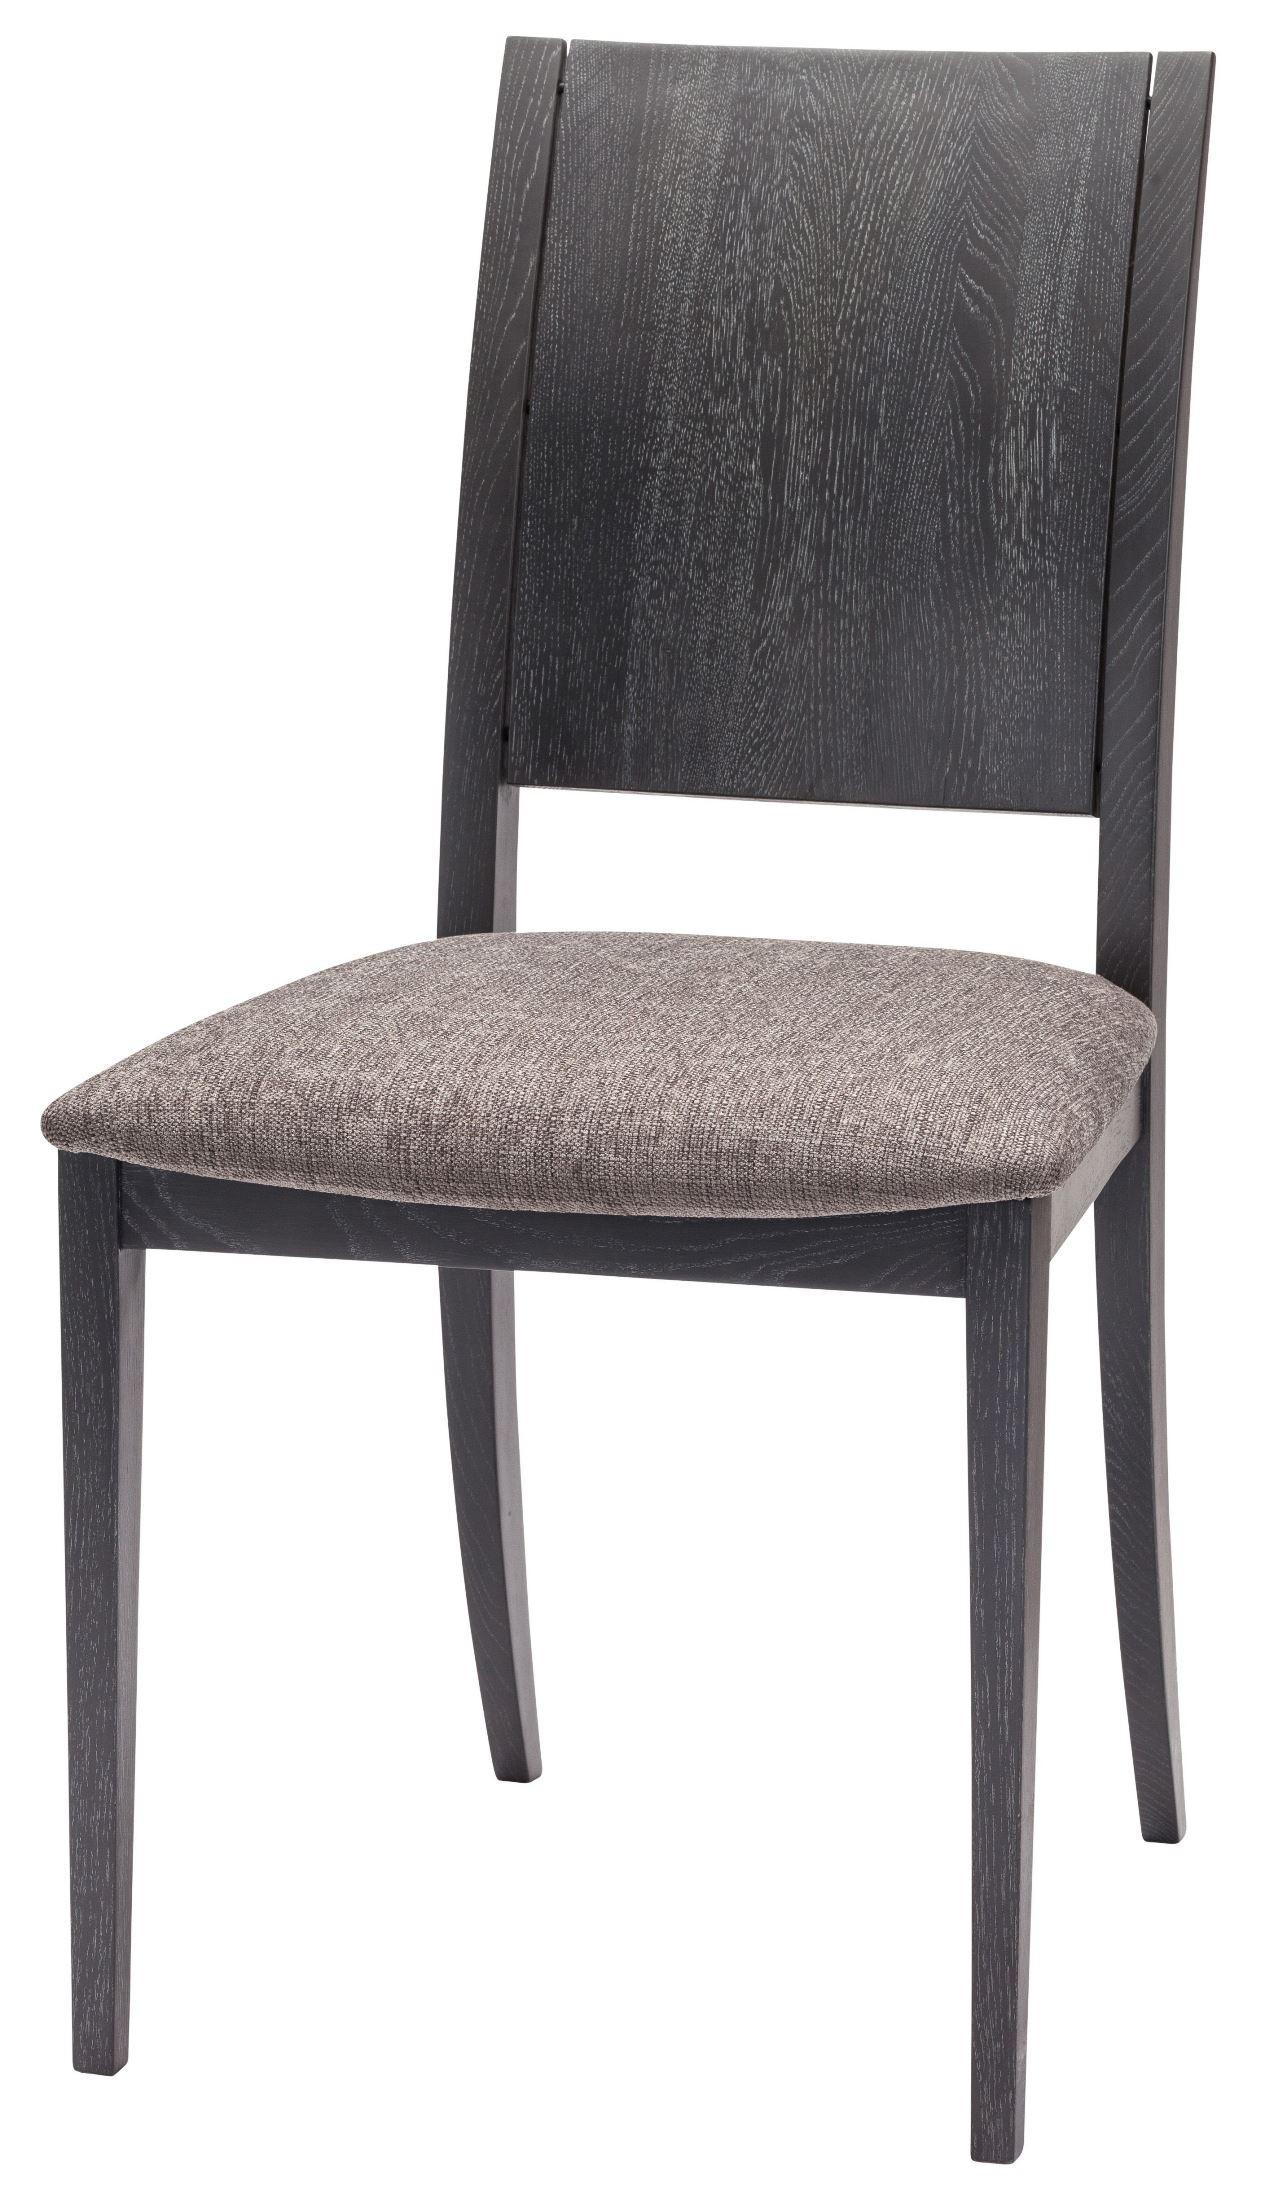 Eska Dark Grey Fabric Dining Chair From Nuevo Coleman Furniture